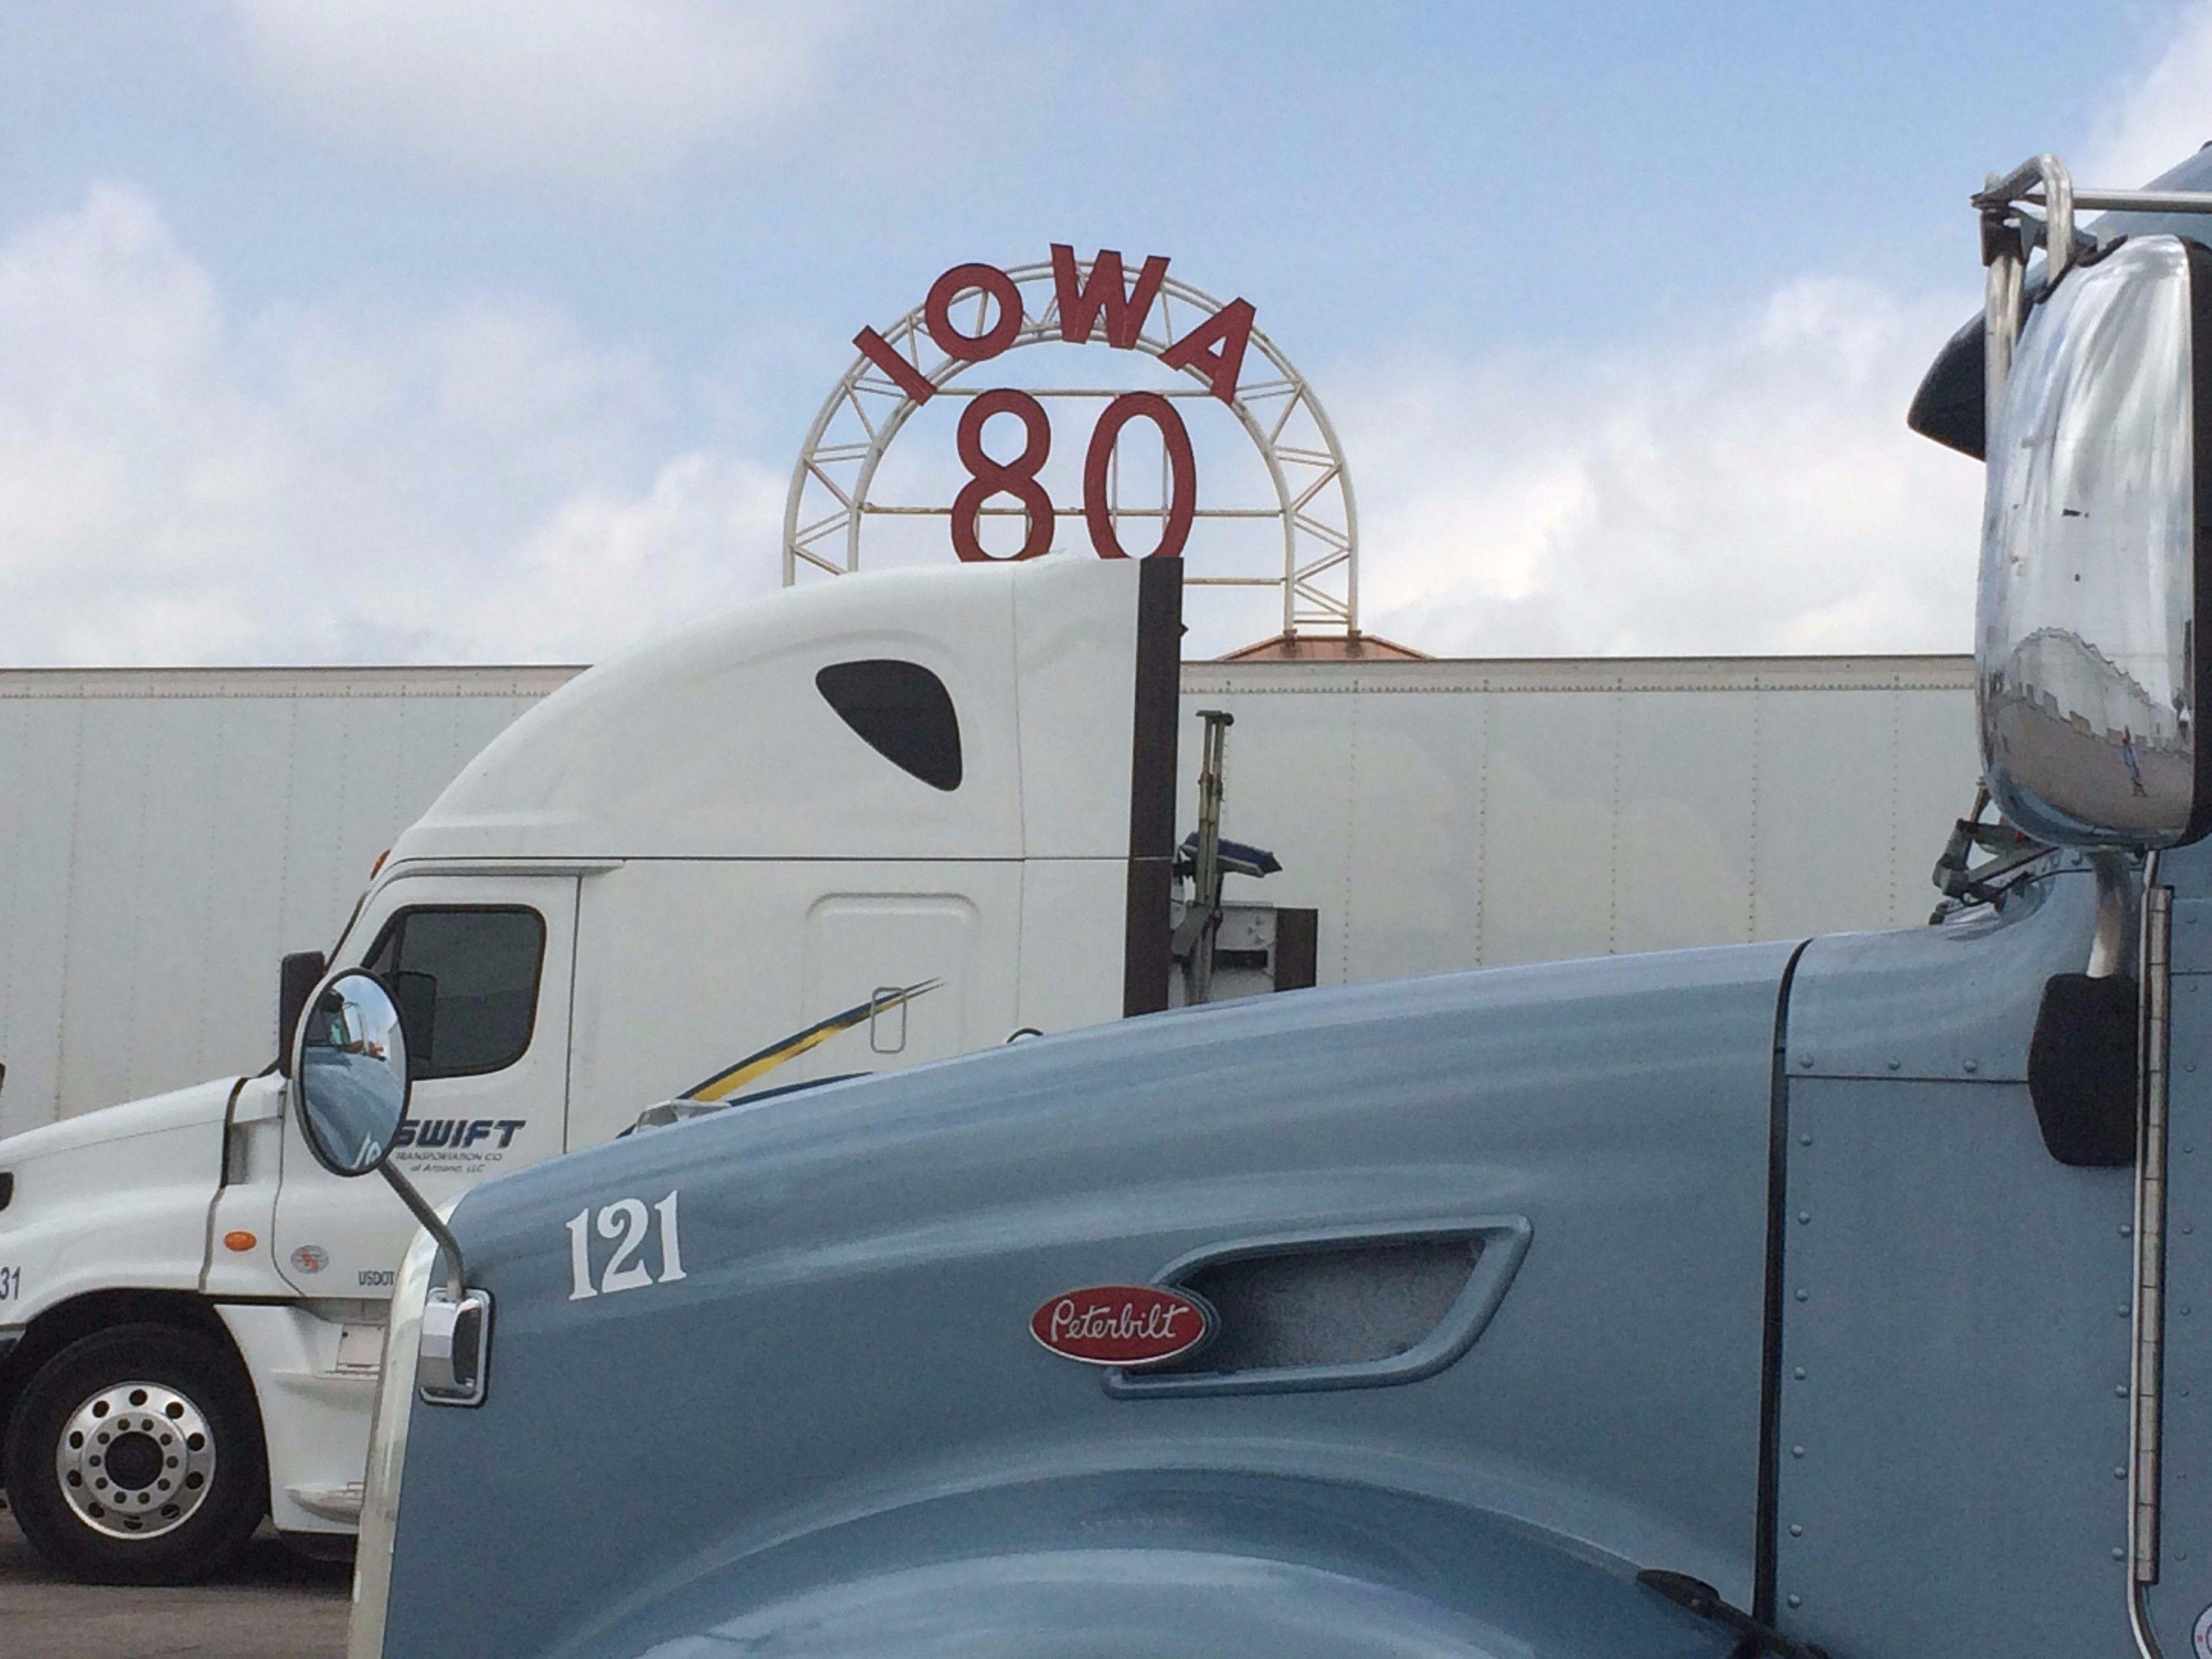 Trucks roll into Walcott for annual Jamboree